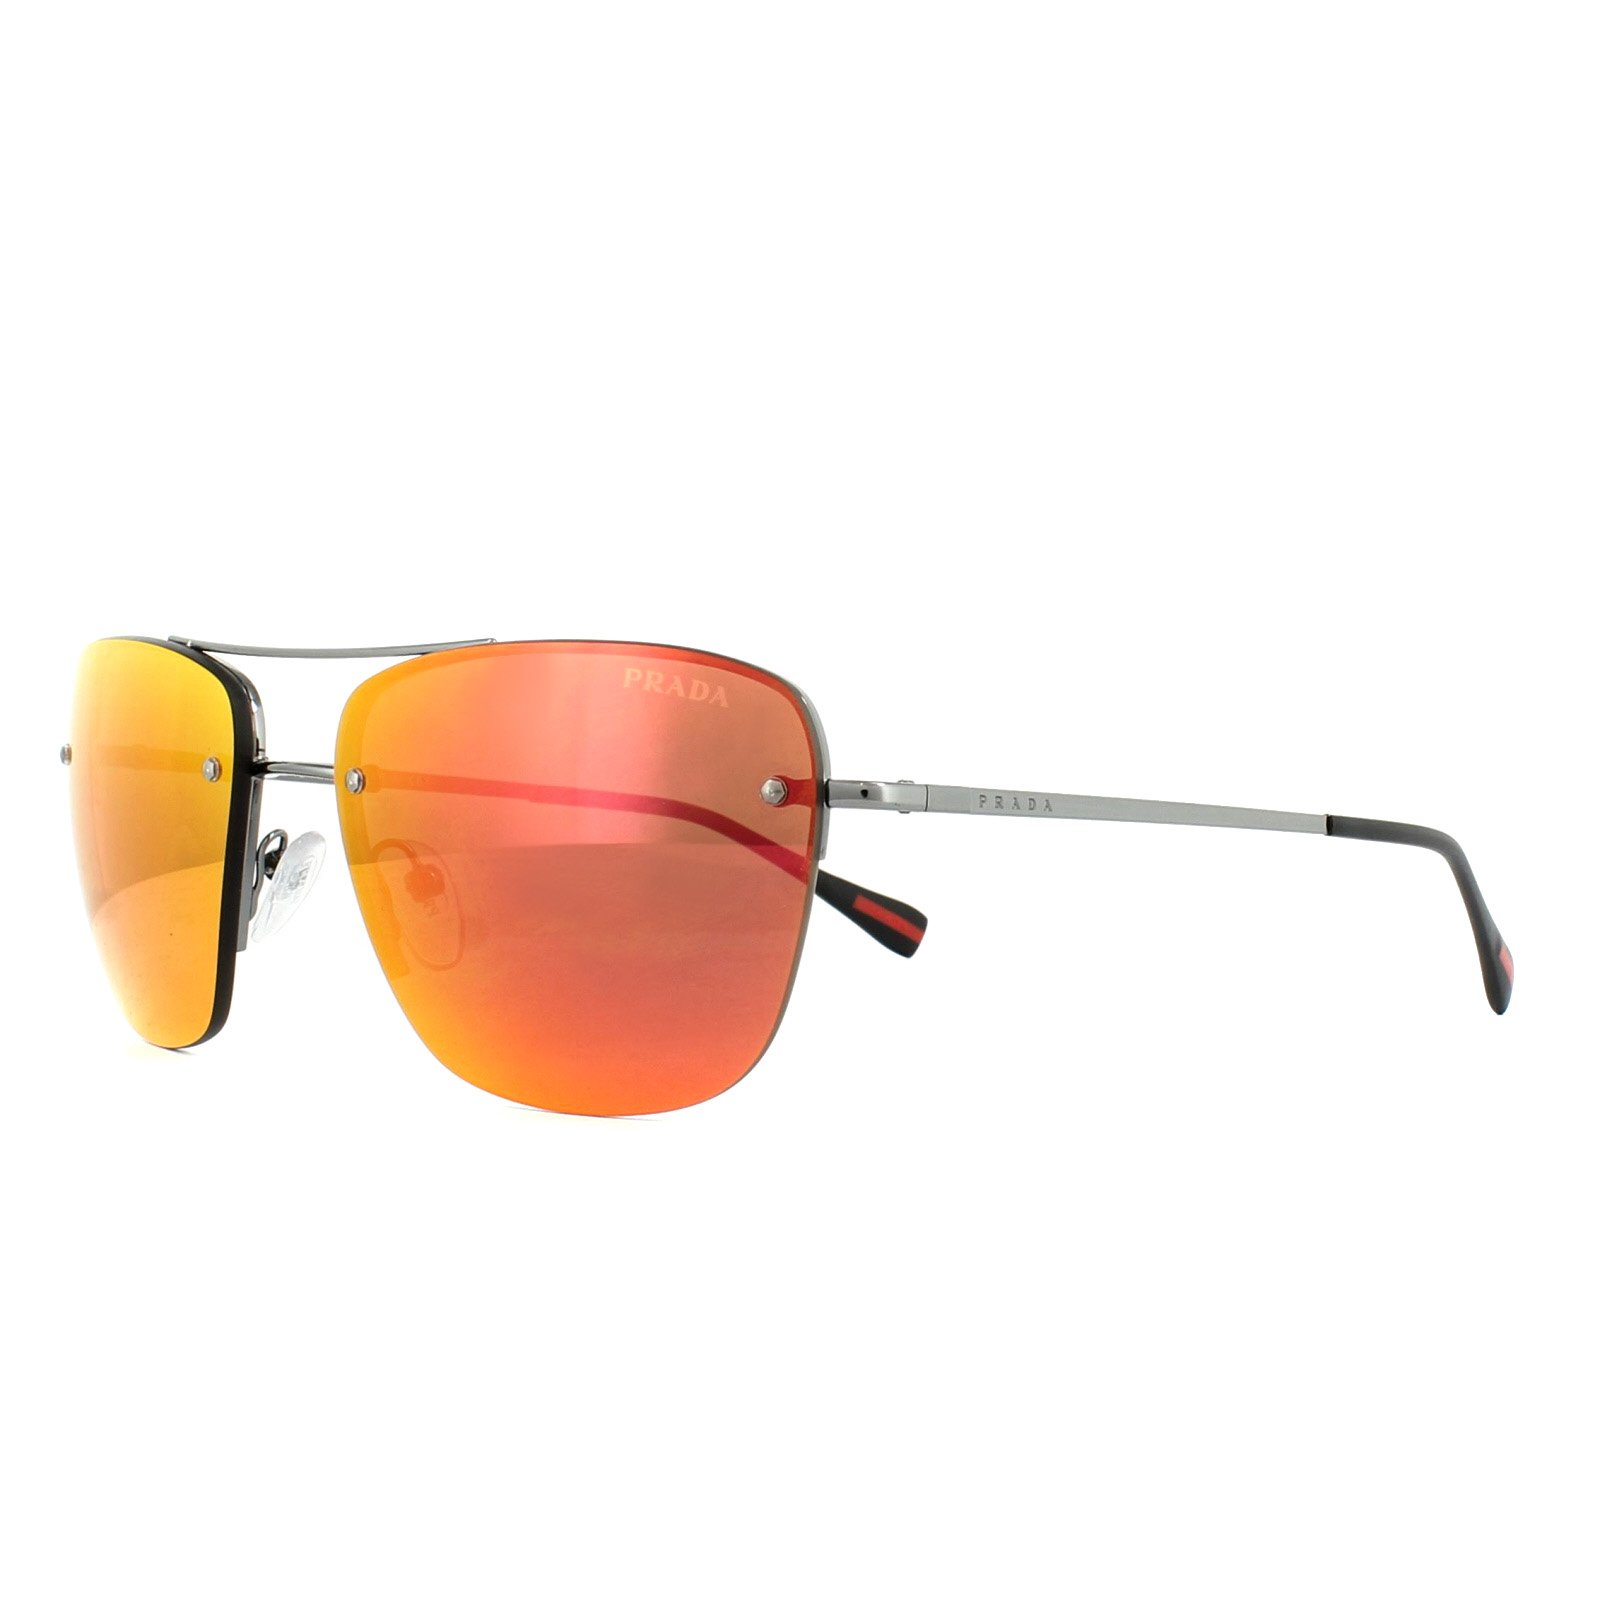 14daad199ae8 SENTINEL Prada Sport Occhiali da sole 52RS 5AV5M0 Gunmetal specchio marrone  arancio